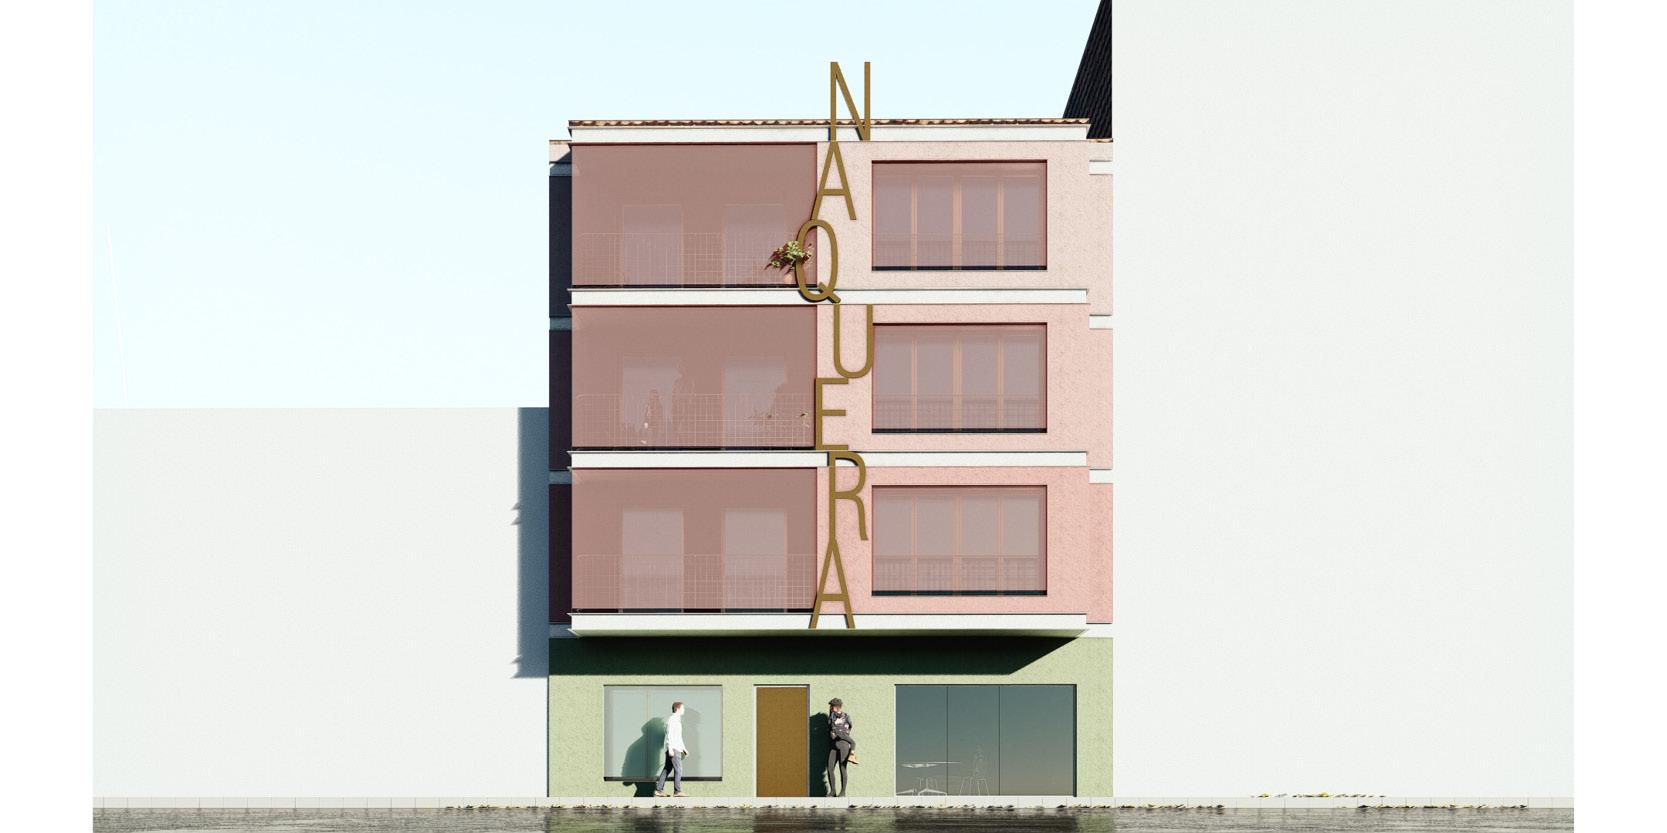 OCA architects arquitectos arquitectes Reforma energética de fachada de oficinas municipales en Naquera Valencia Hernan Lleida Bernardo Garcia